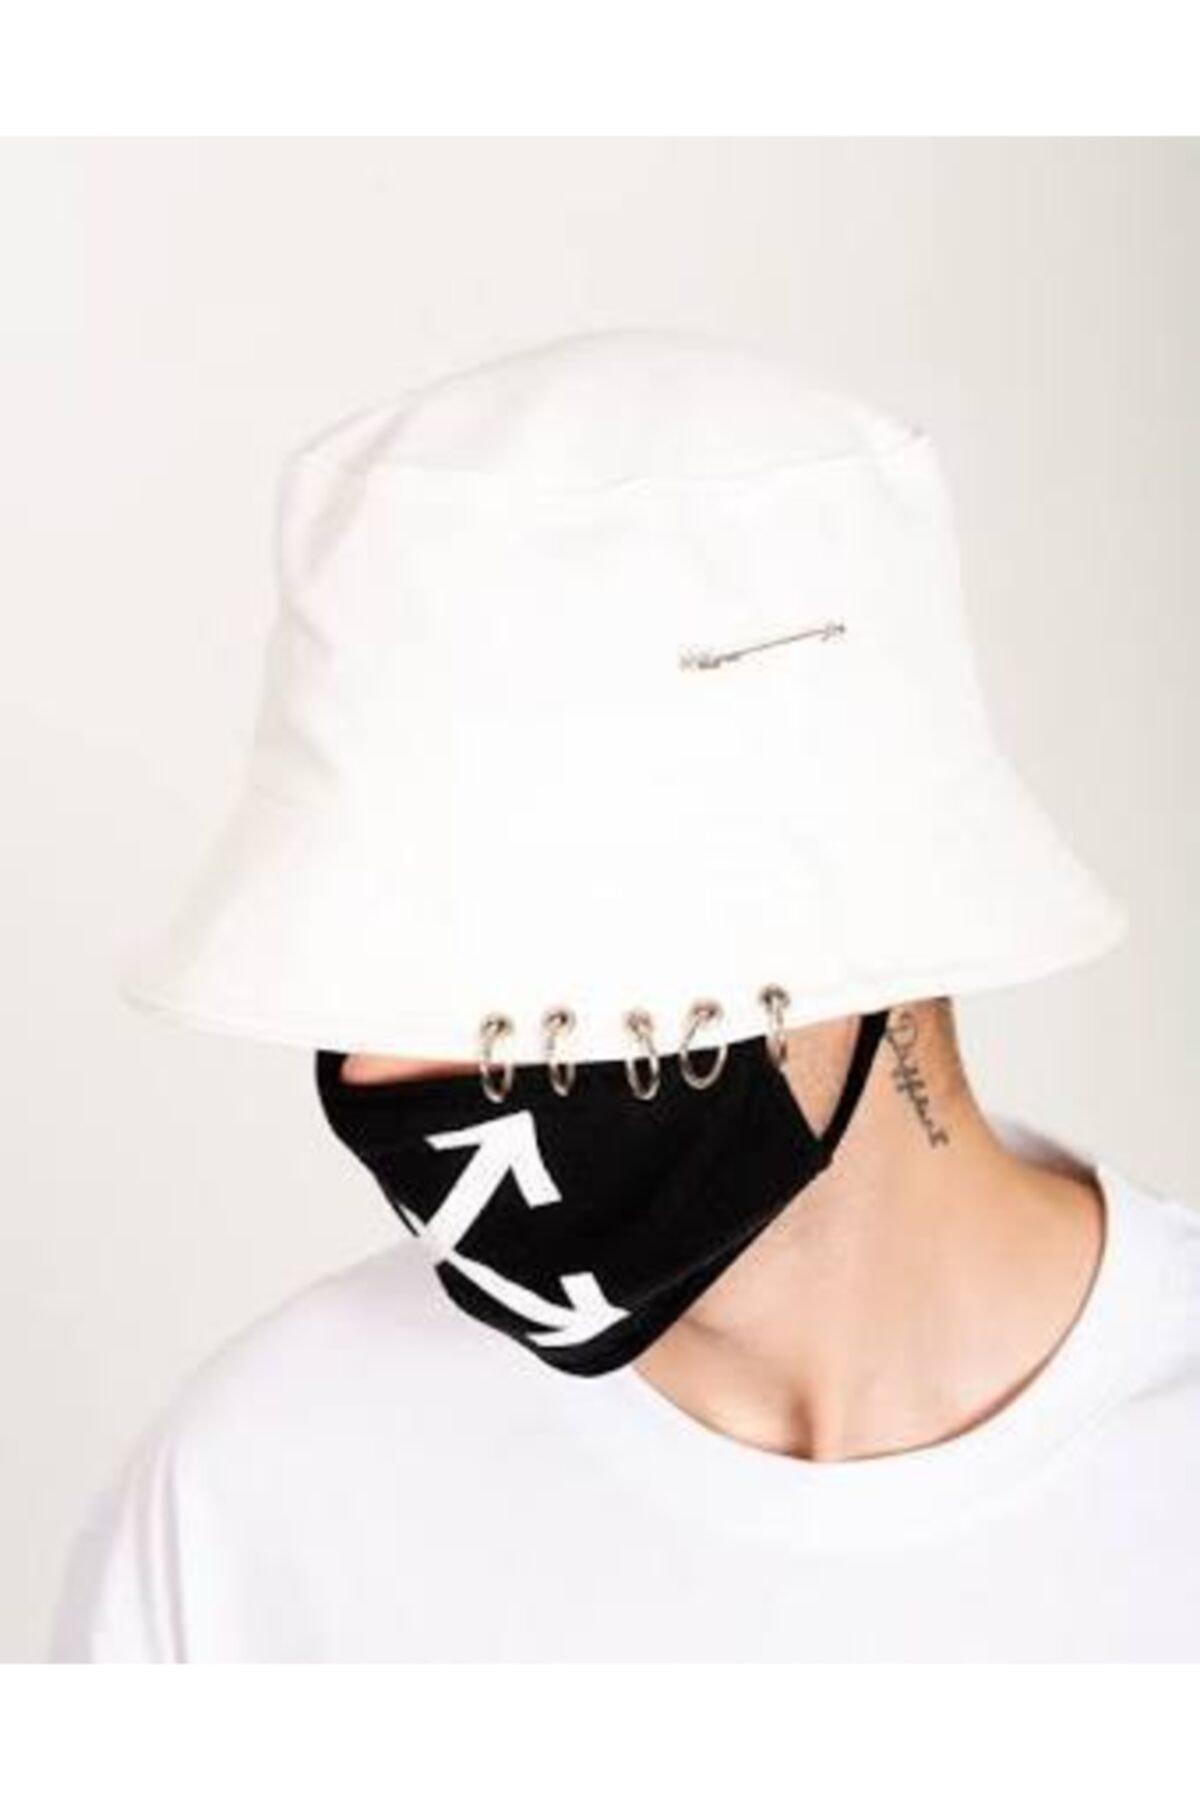 Piercingli Beyaz Bucket Hat Kova Şapka